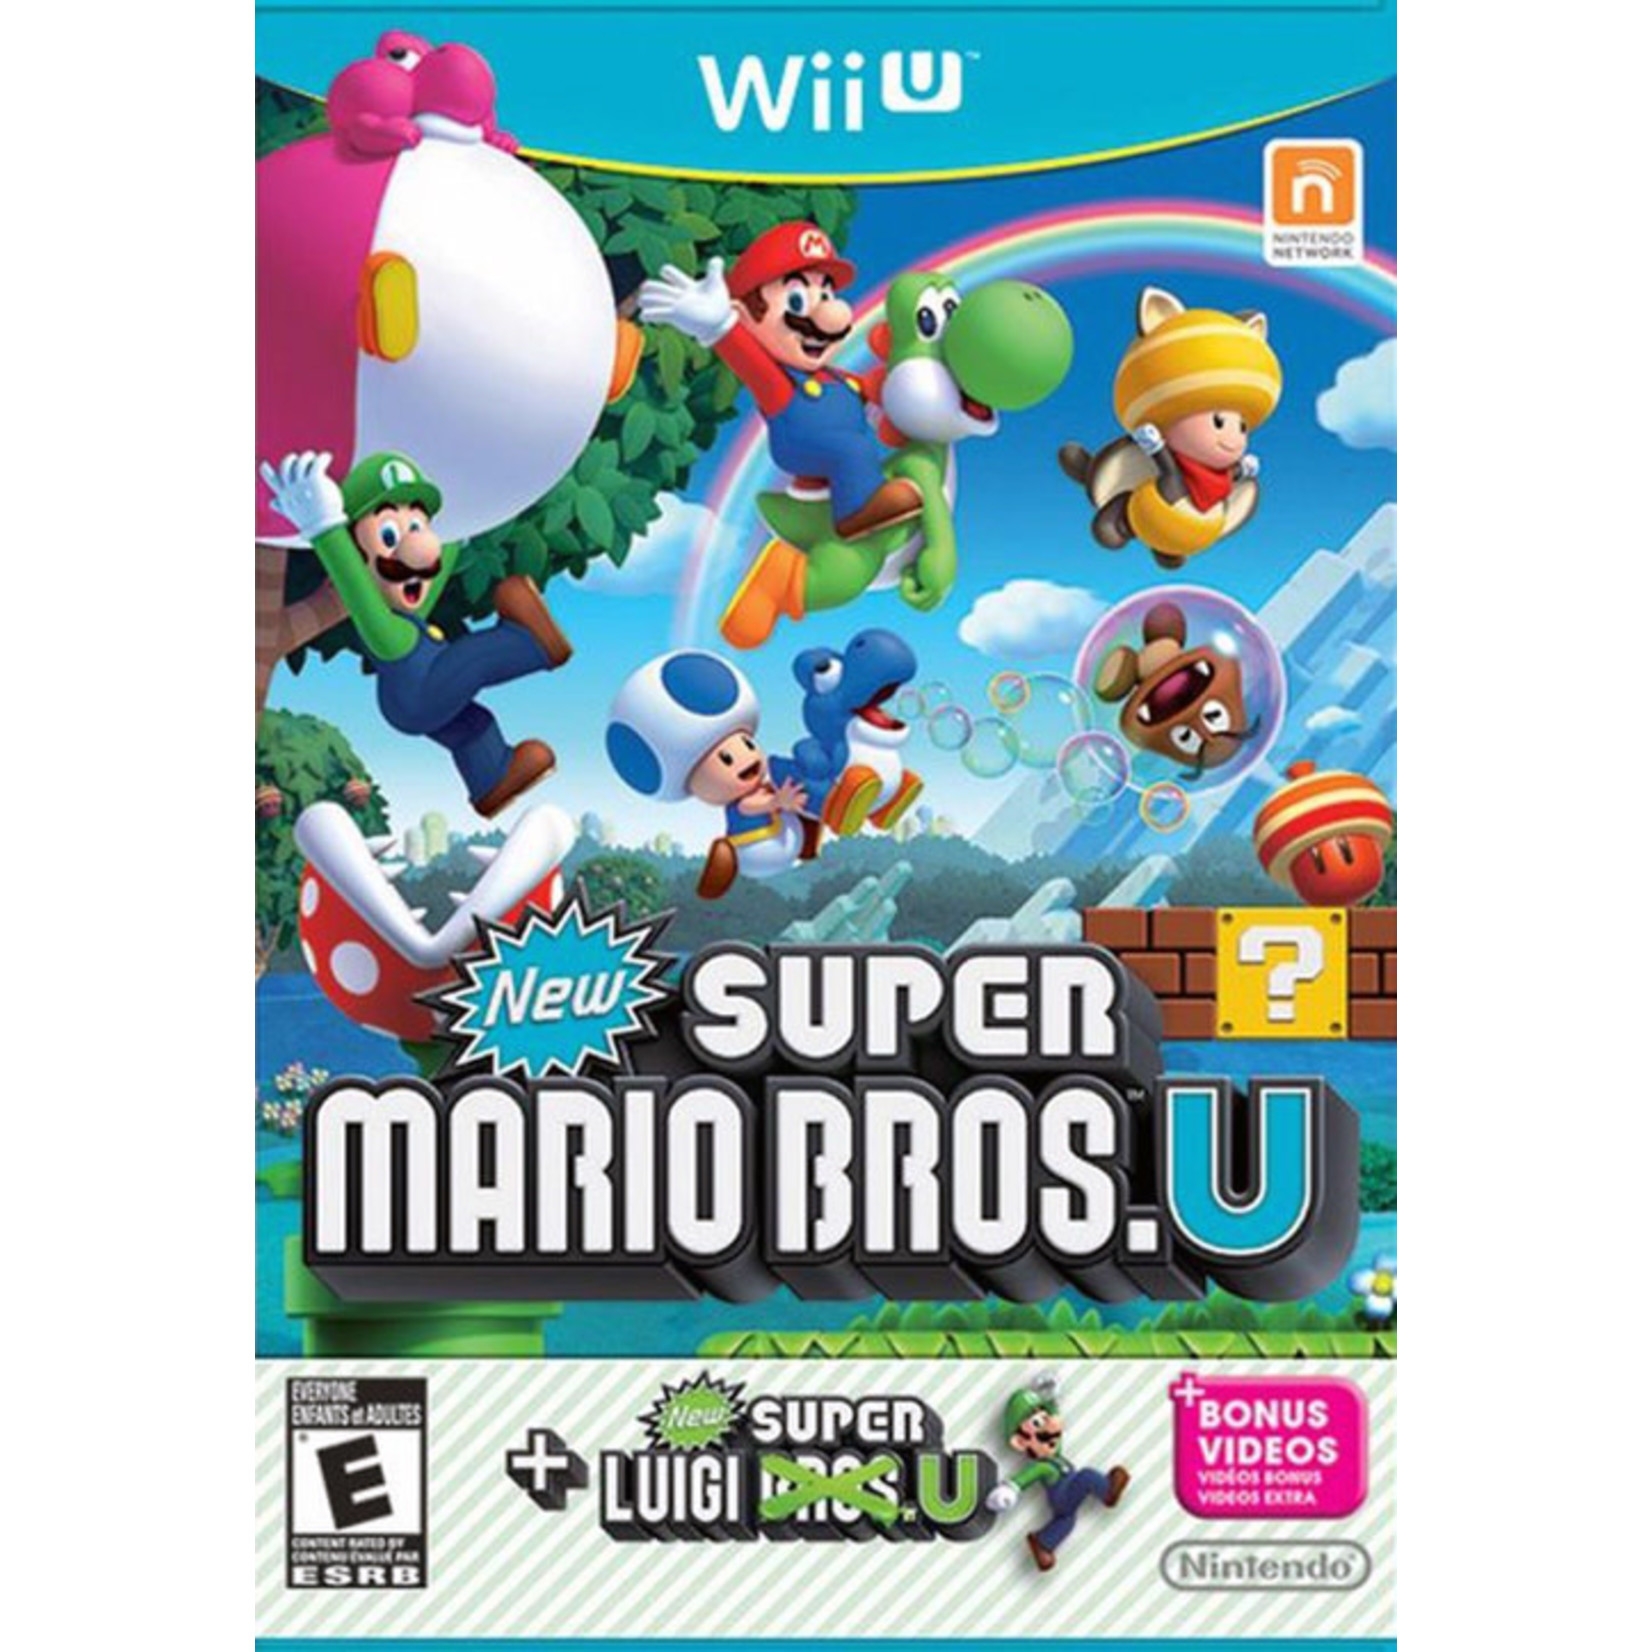 WIIUUSD-New Super Mario Bros. U